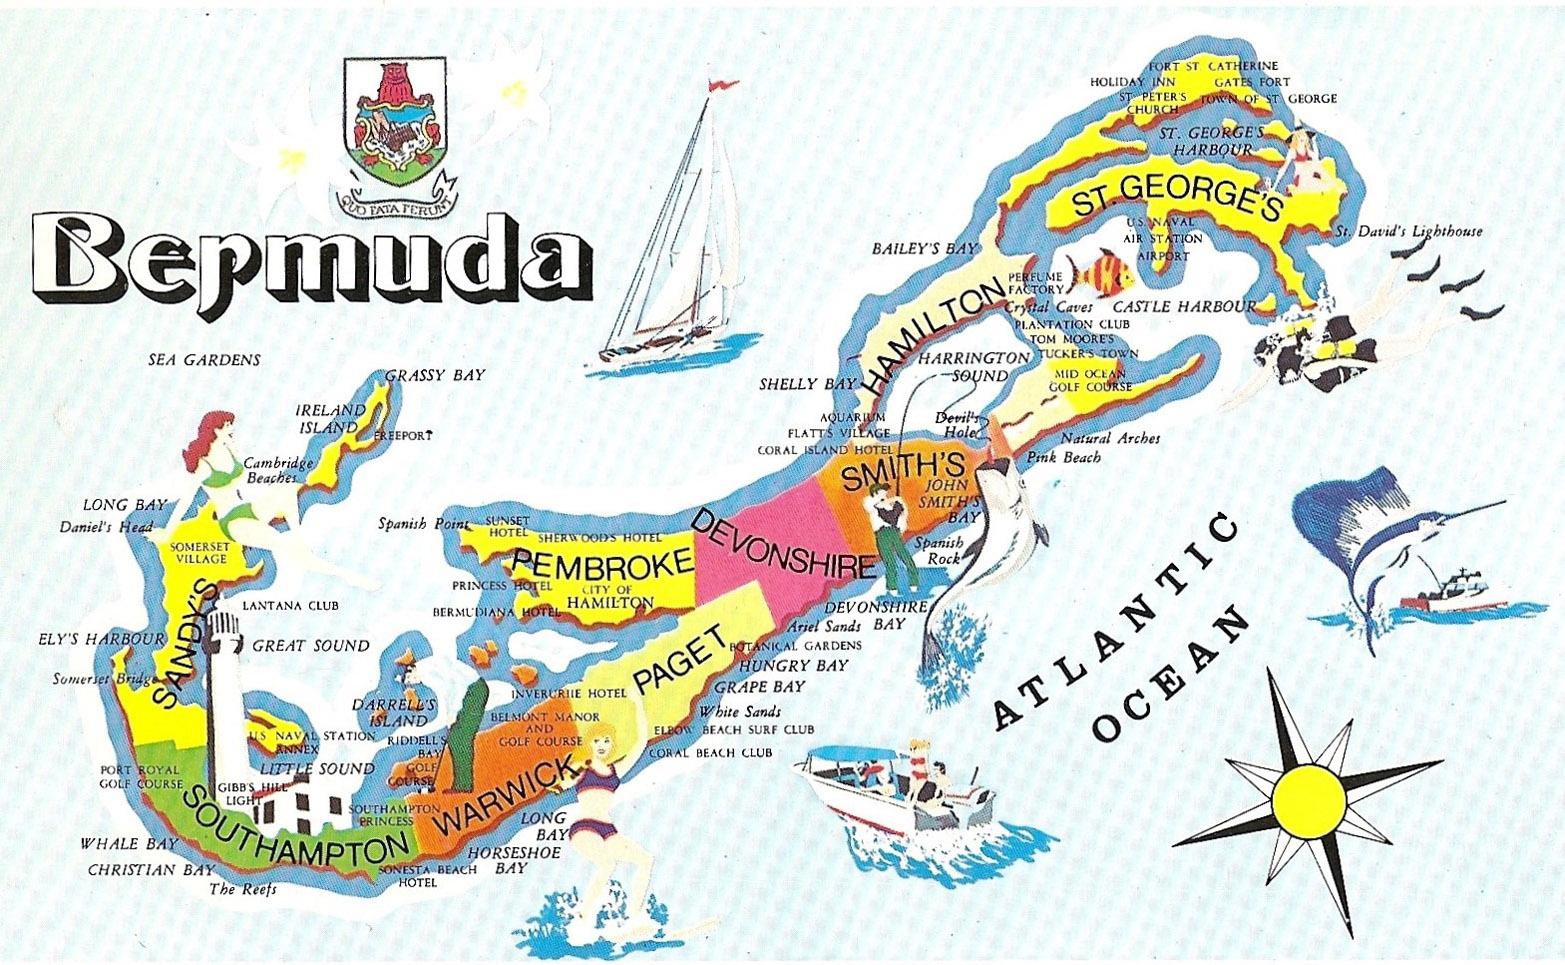 Map Of Bermuda Beaches Large travel illustrated map of Bermuda | Bermuda | North America